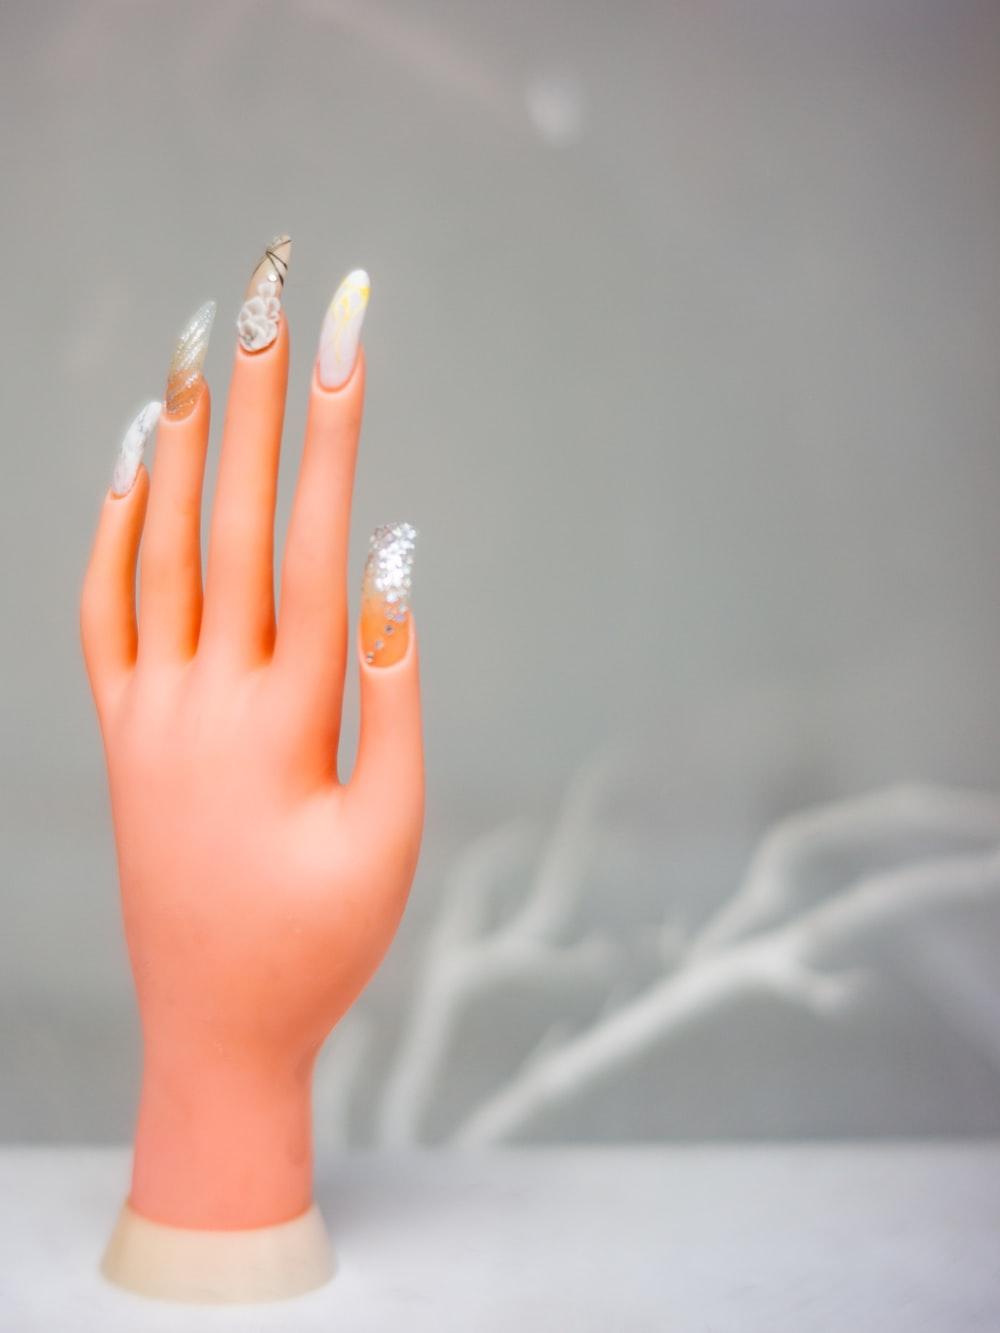 person with white nail polish